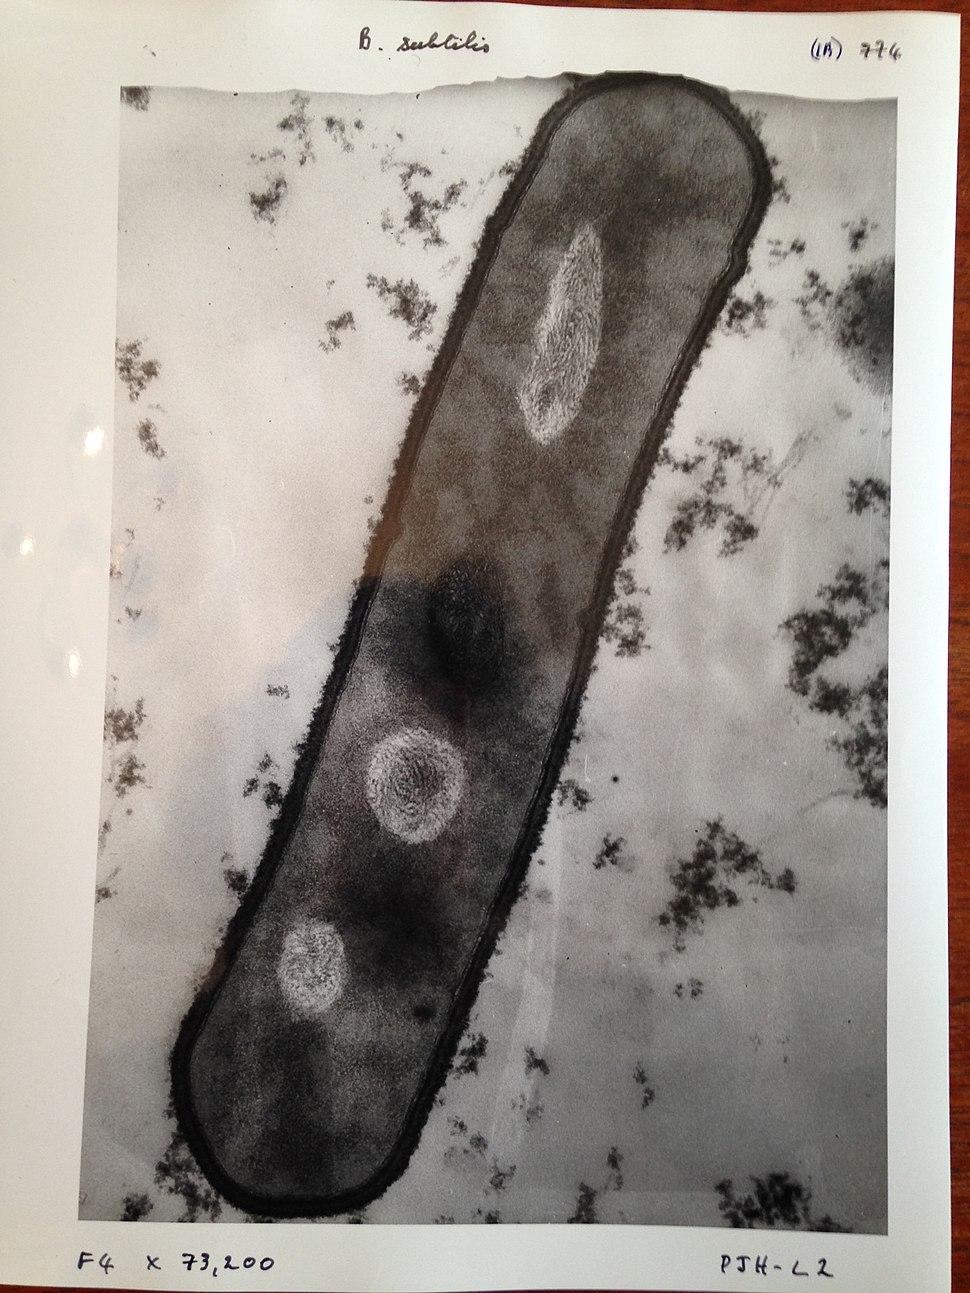 Bacillus subtilis image